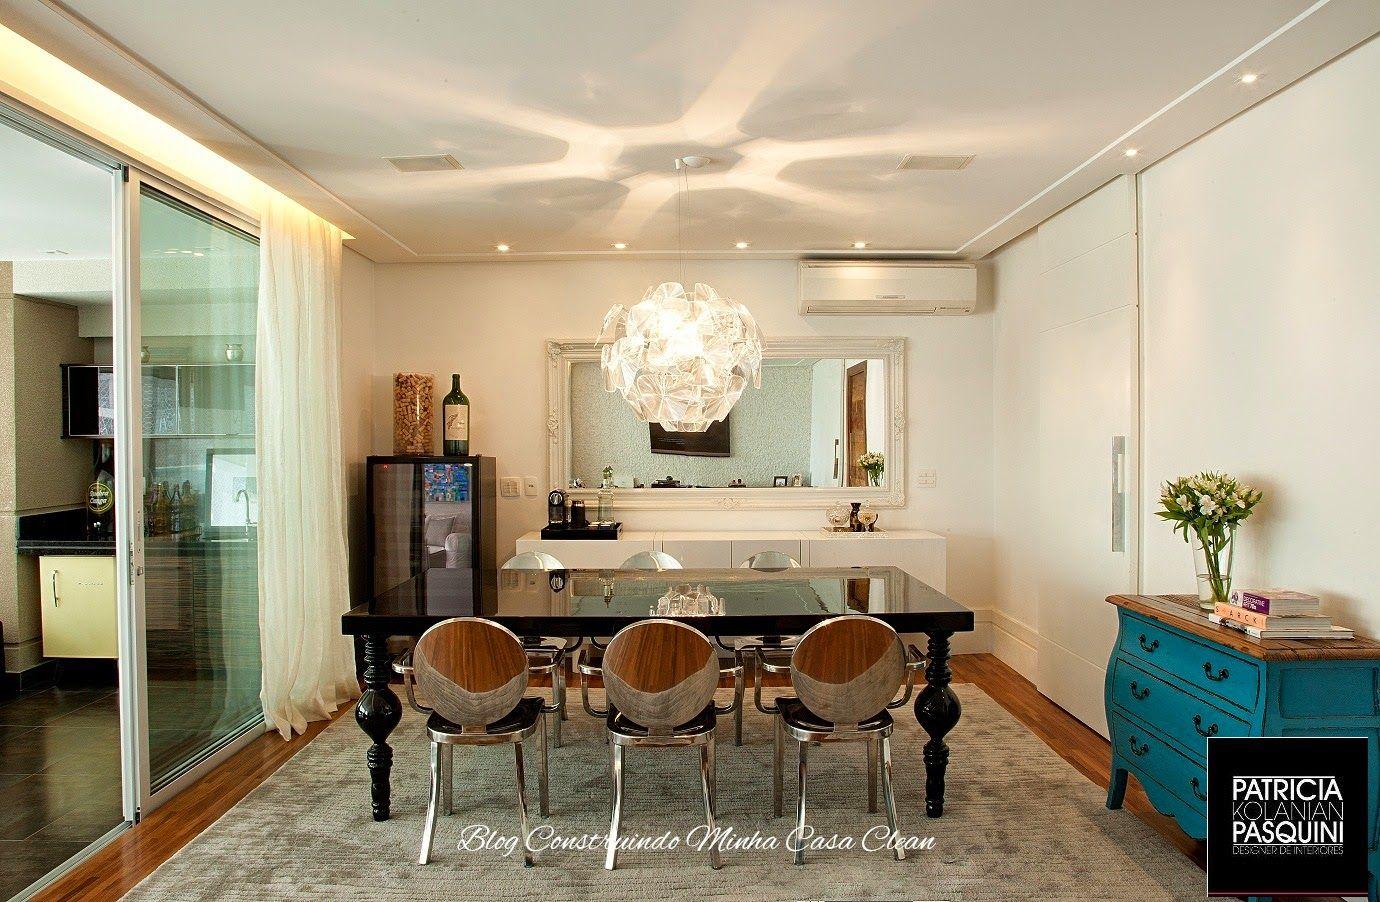 Qual Lustre Ou Pendente Usar Na Sala De Jantar Sala De Jantar  -> Lustres Pendentes Para Sala De Jantar Pequena